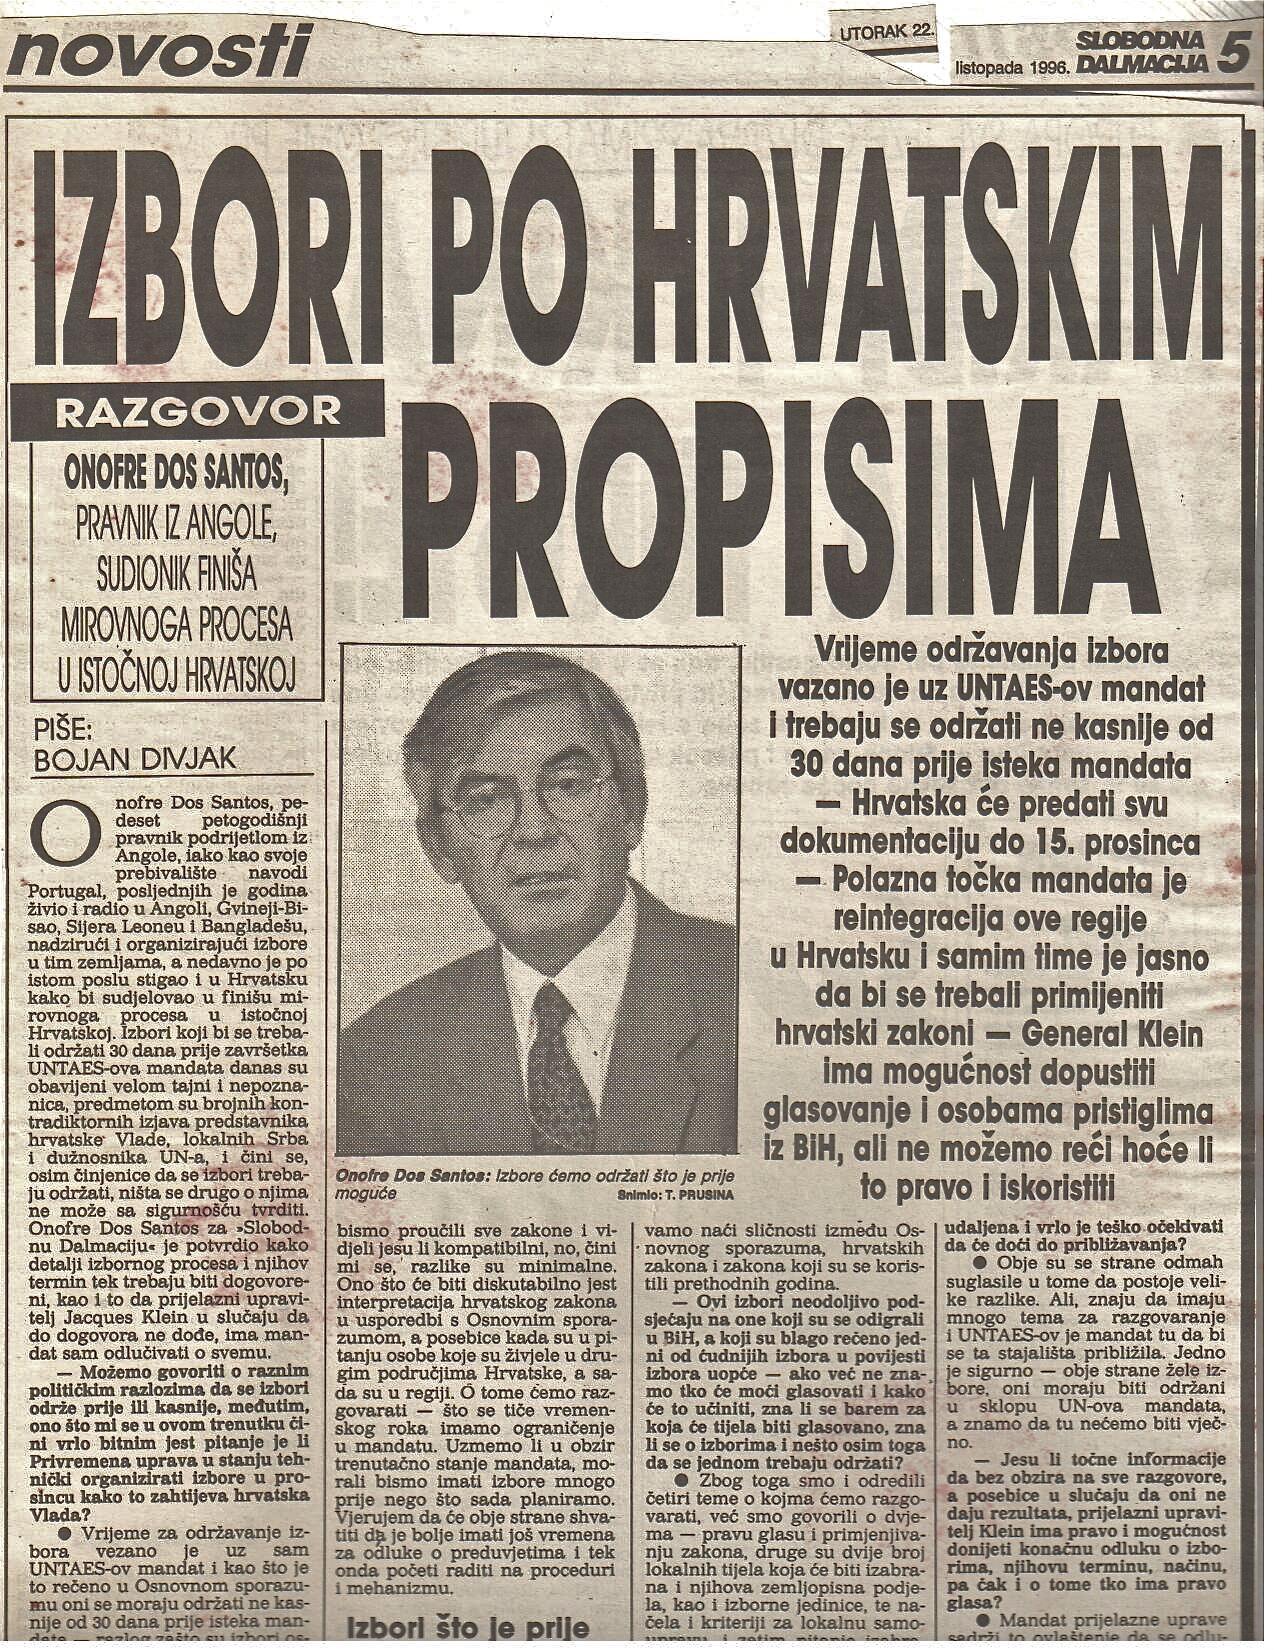 Eleições na Croácia 1997